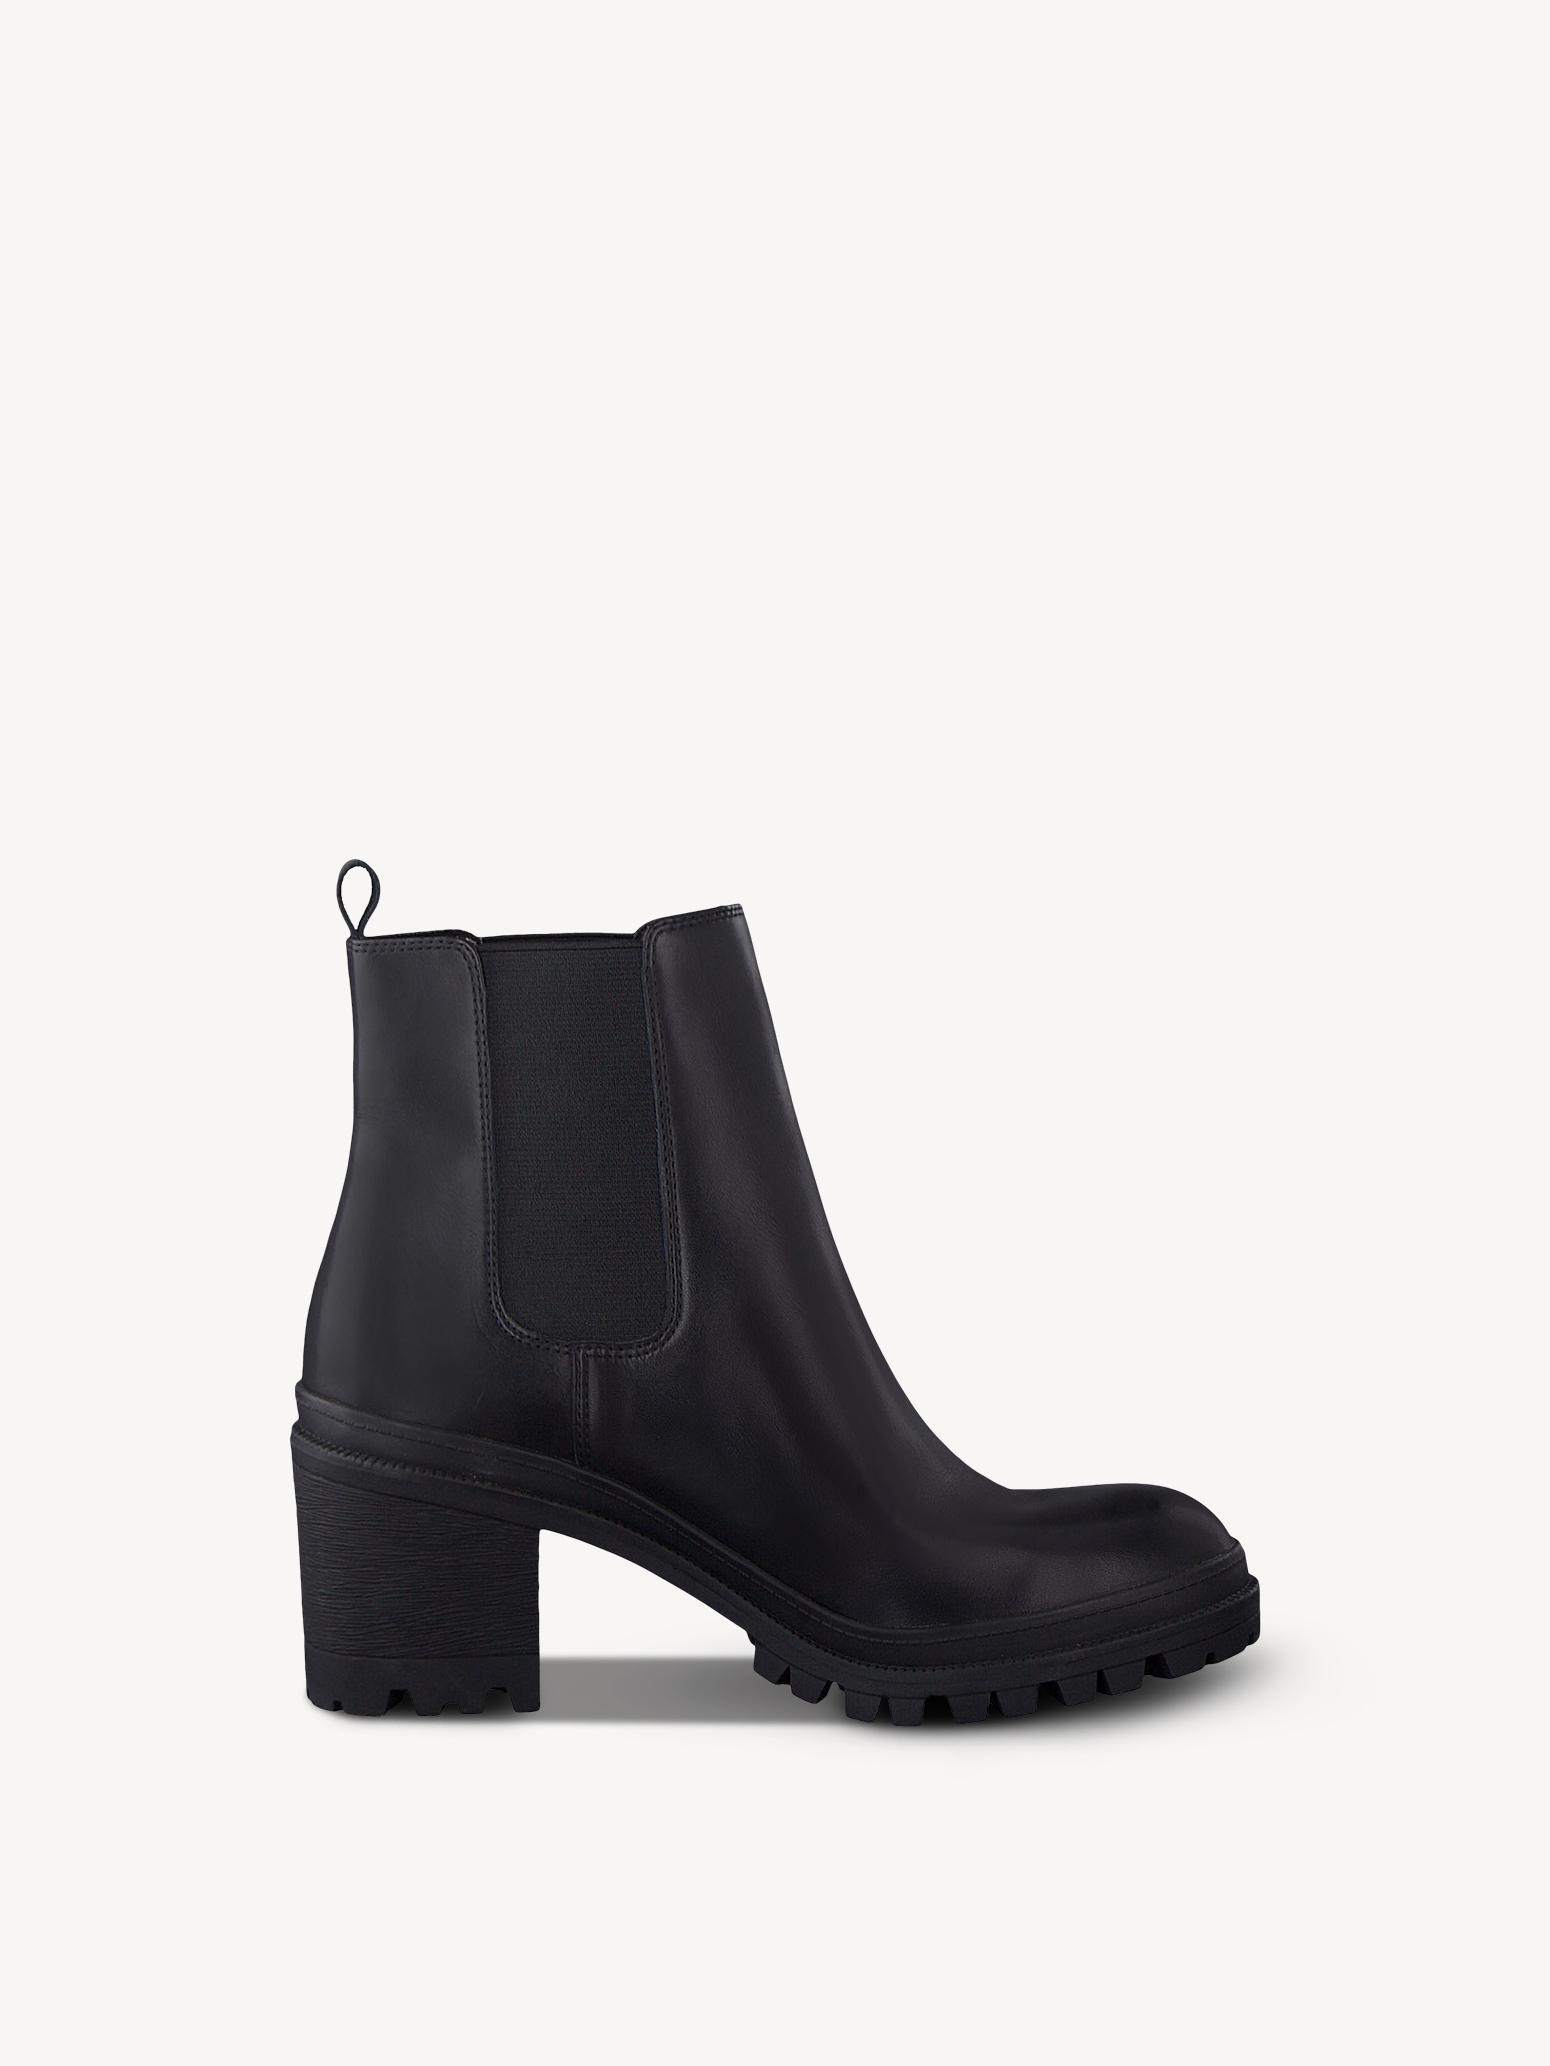 25417 Boot 1 Chelsea 1 Boots Online Leder 23Tamaris Kaufen xQCBWrdoeE